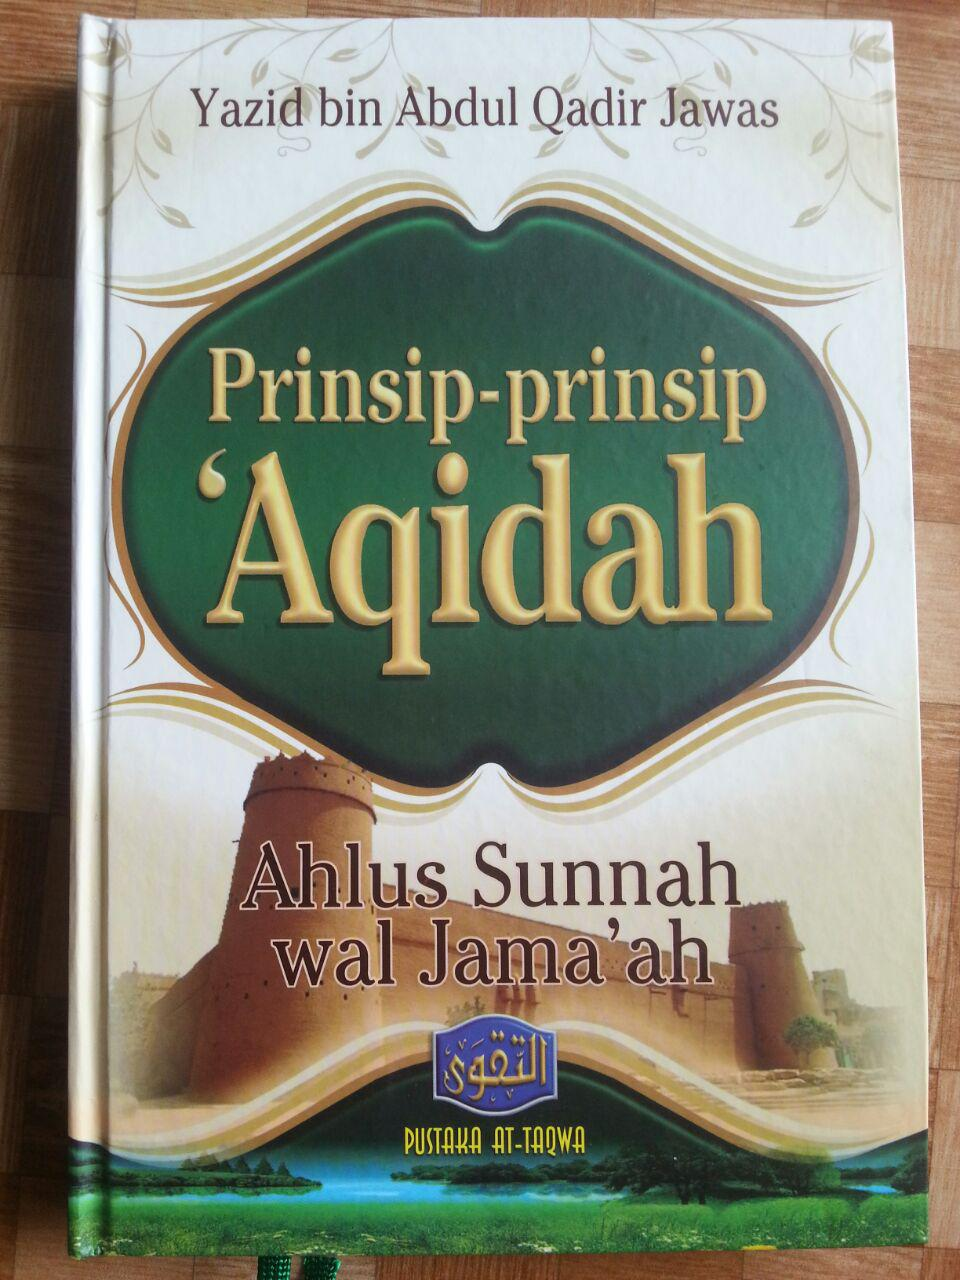 Buku Prinsip-Prinsip Aqidah Ahlus Sunnah Wal Jamaah cover 2